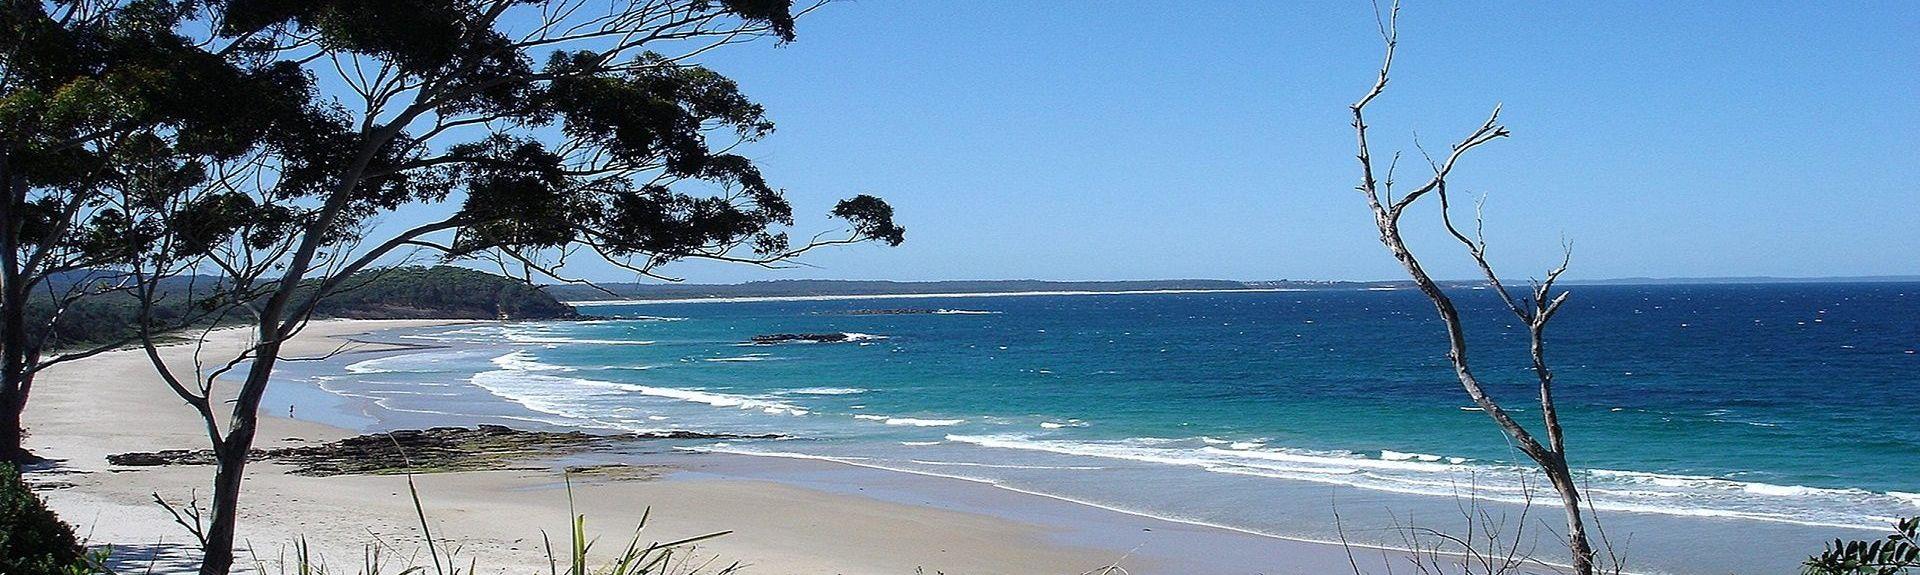 Conjola, New South Wales, Australia